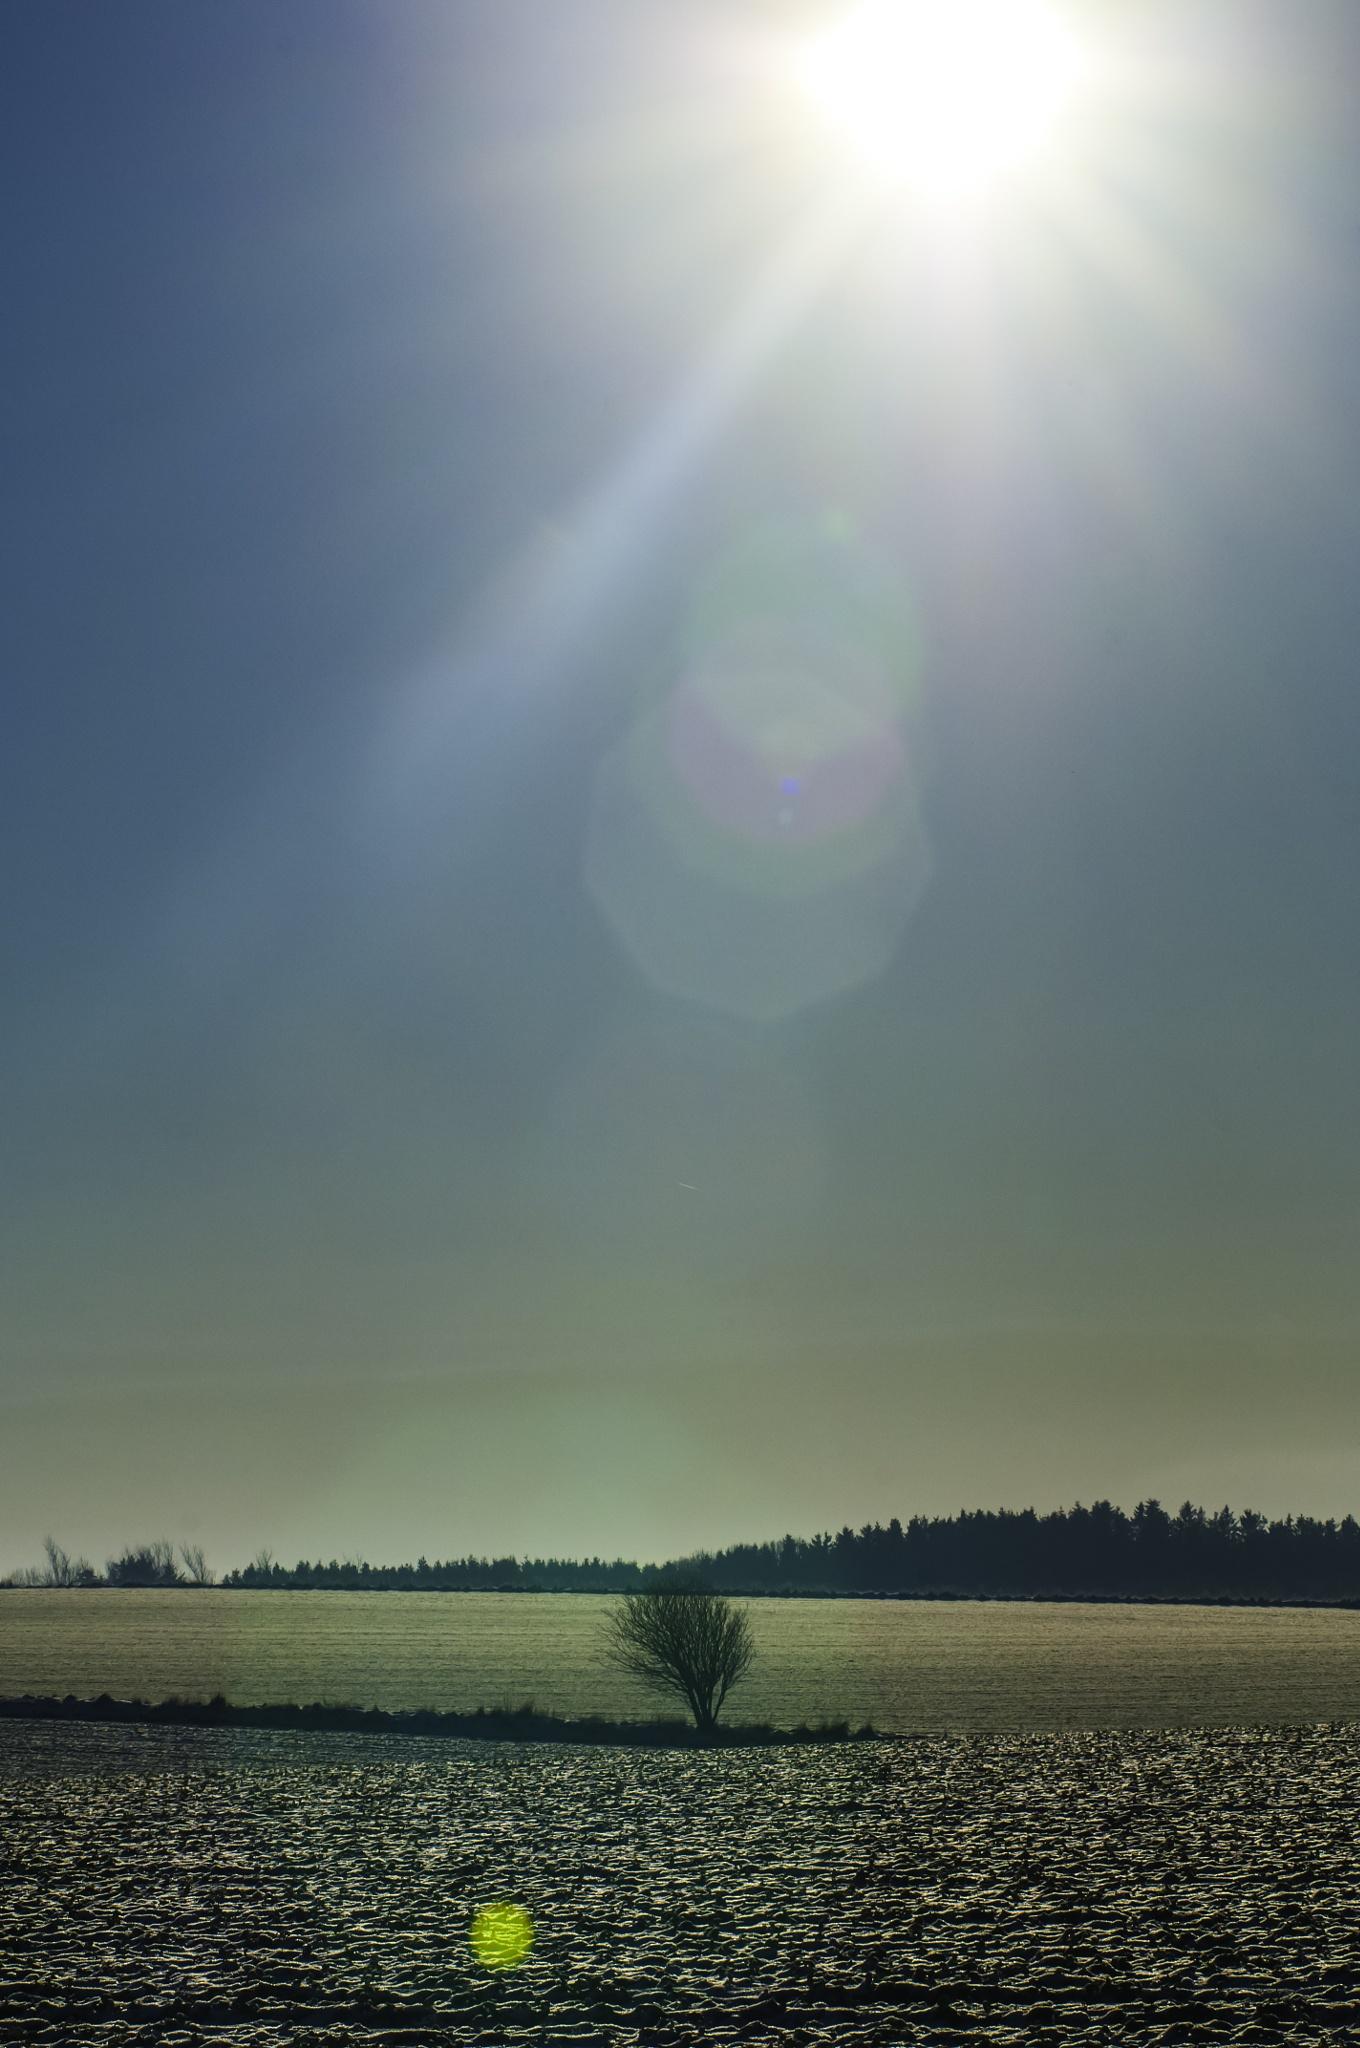 Lone shrub/tree-wanna-be by Steen Skov